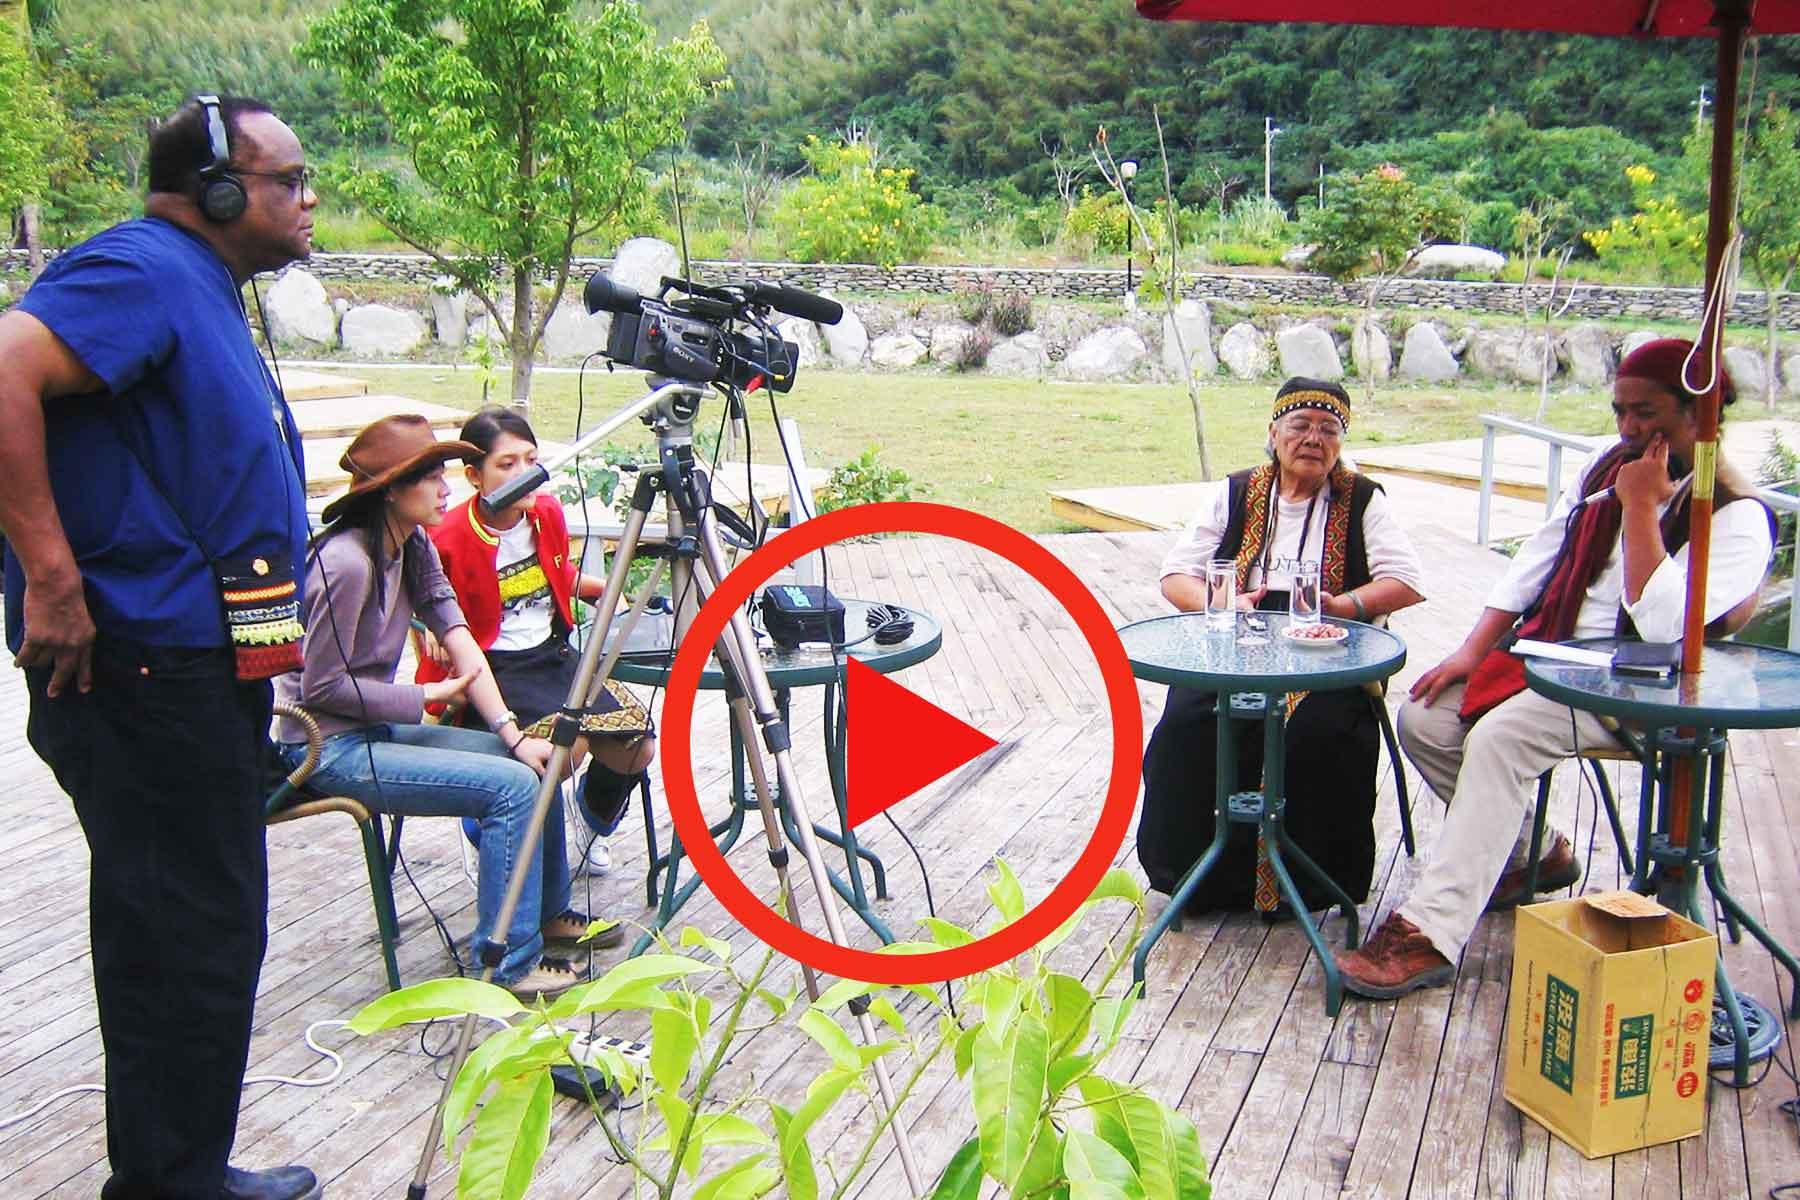 Ethnographic Research and Film - Steven Andrew Martin - Laipunuk Bunun - Taitung Taiwan